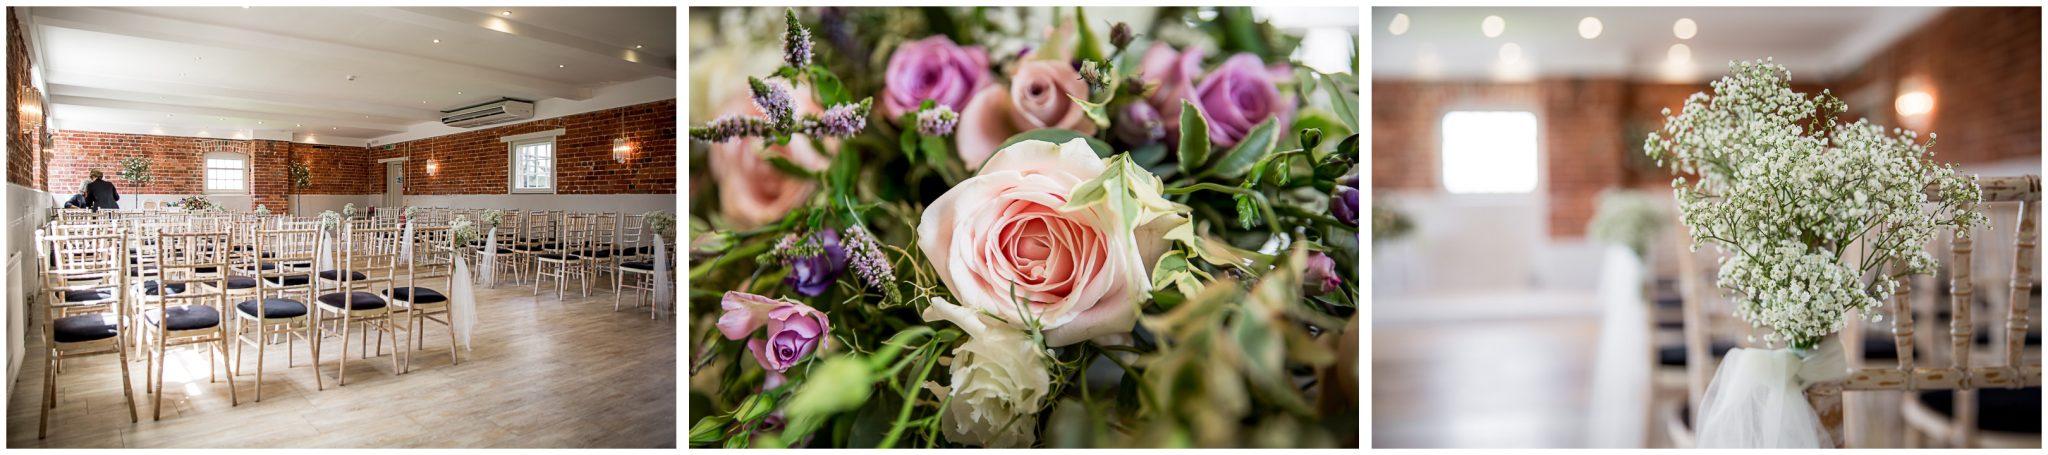 Sopley Mill wedding photography ceremony room set up